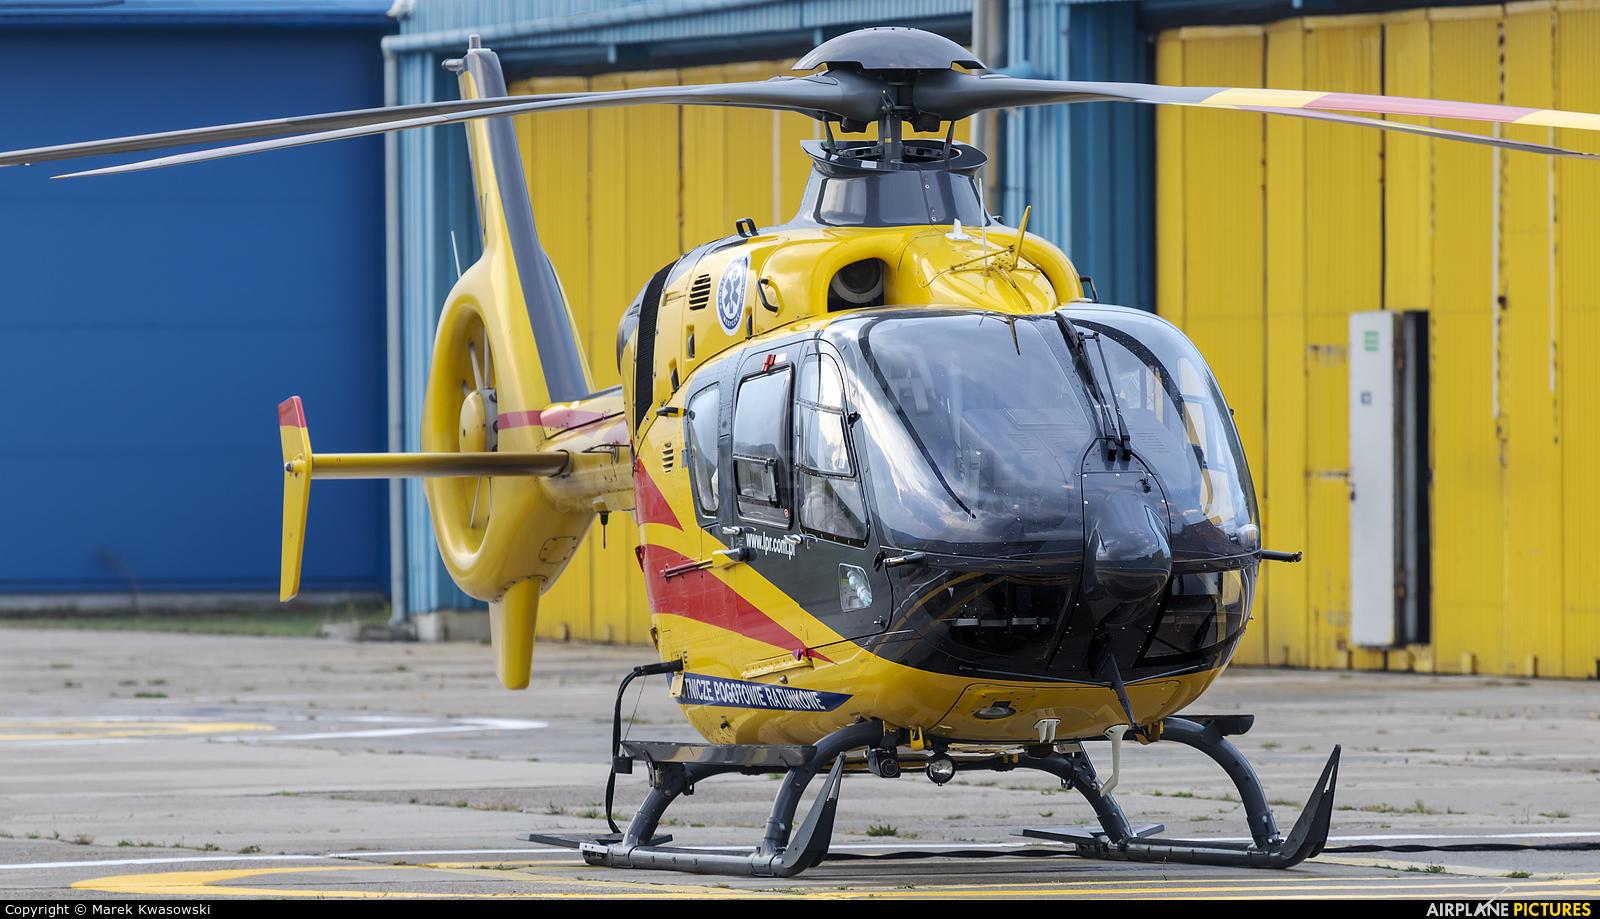 Polish Medical Air Rescue - Lotnicze Pogotowie Ratunkowe SP-HXU aircraft at Warsaw - Babice